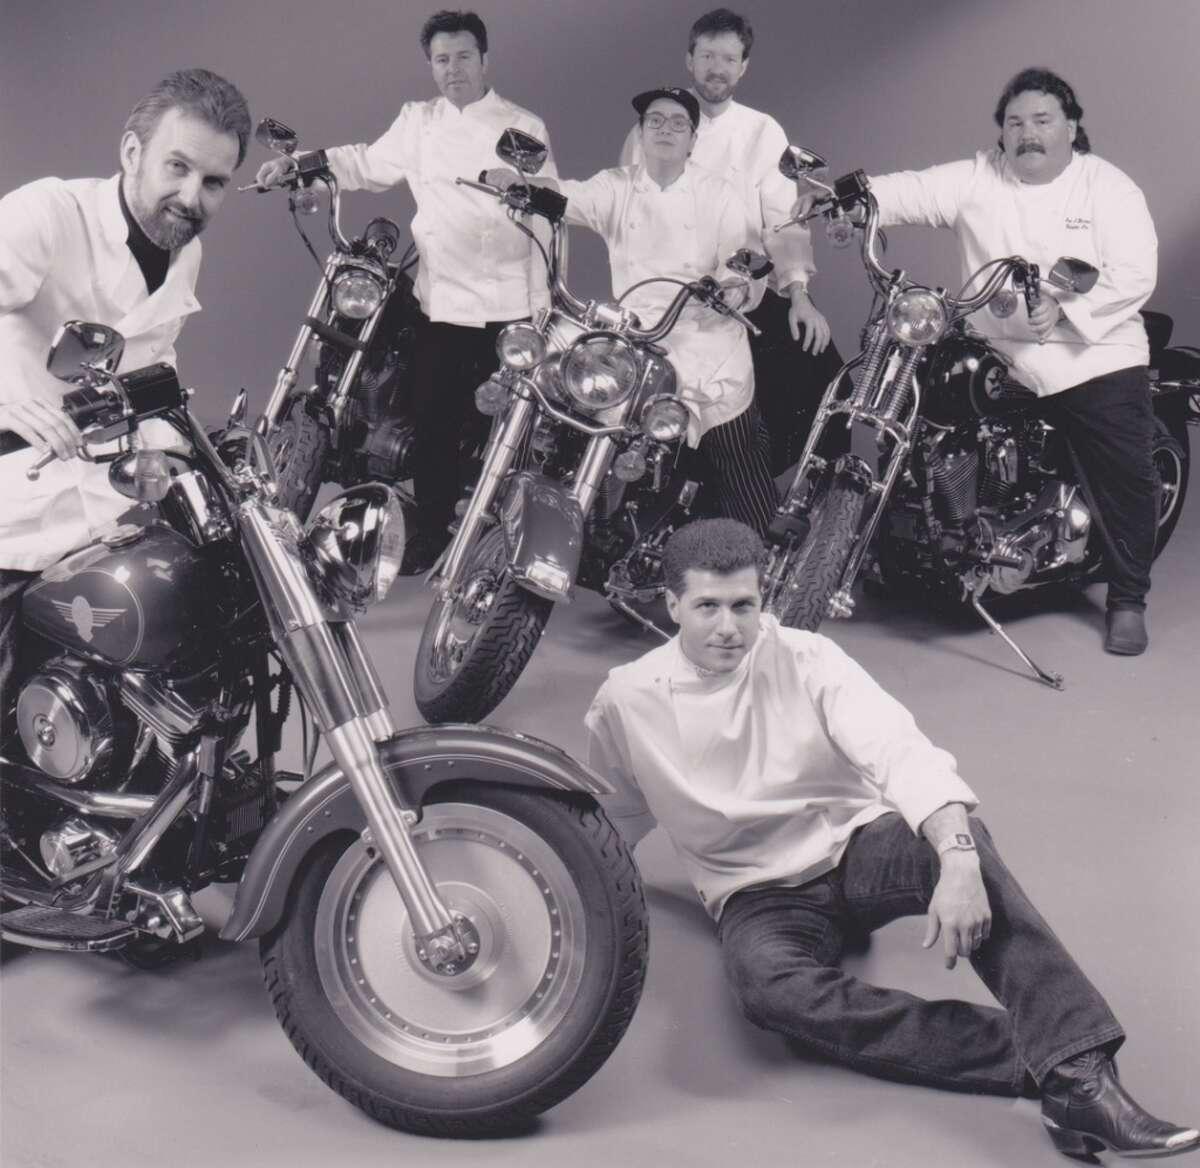 Chefs AND Motorcycles! From left to right clockwise: Hubert Keller (Fleur de Lys), Julian Serrano (Masa's), Elka Gilmore (Elka), David Gingrass (Postrio), Jan Birnbaum (Campton Place), and Michael Chiarello (Tra Vigne), 1993.